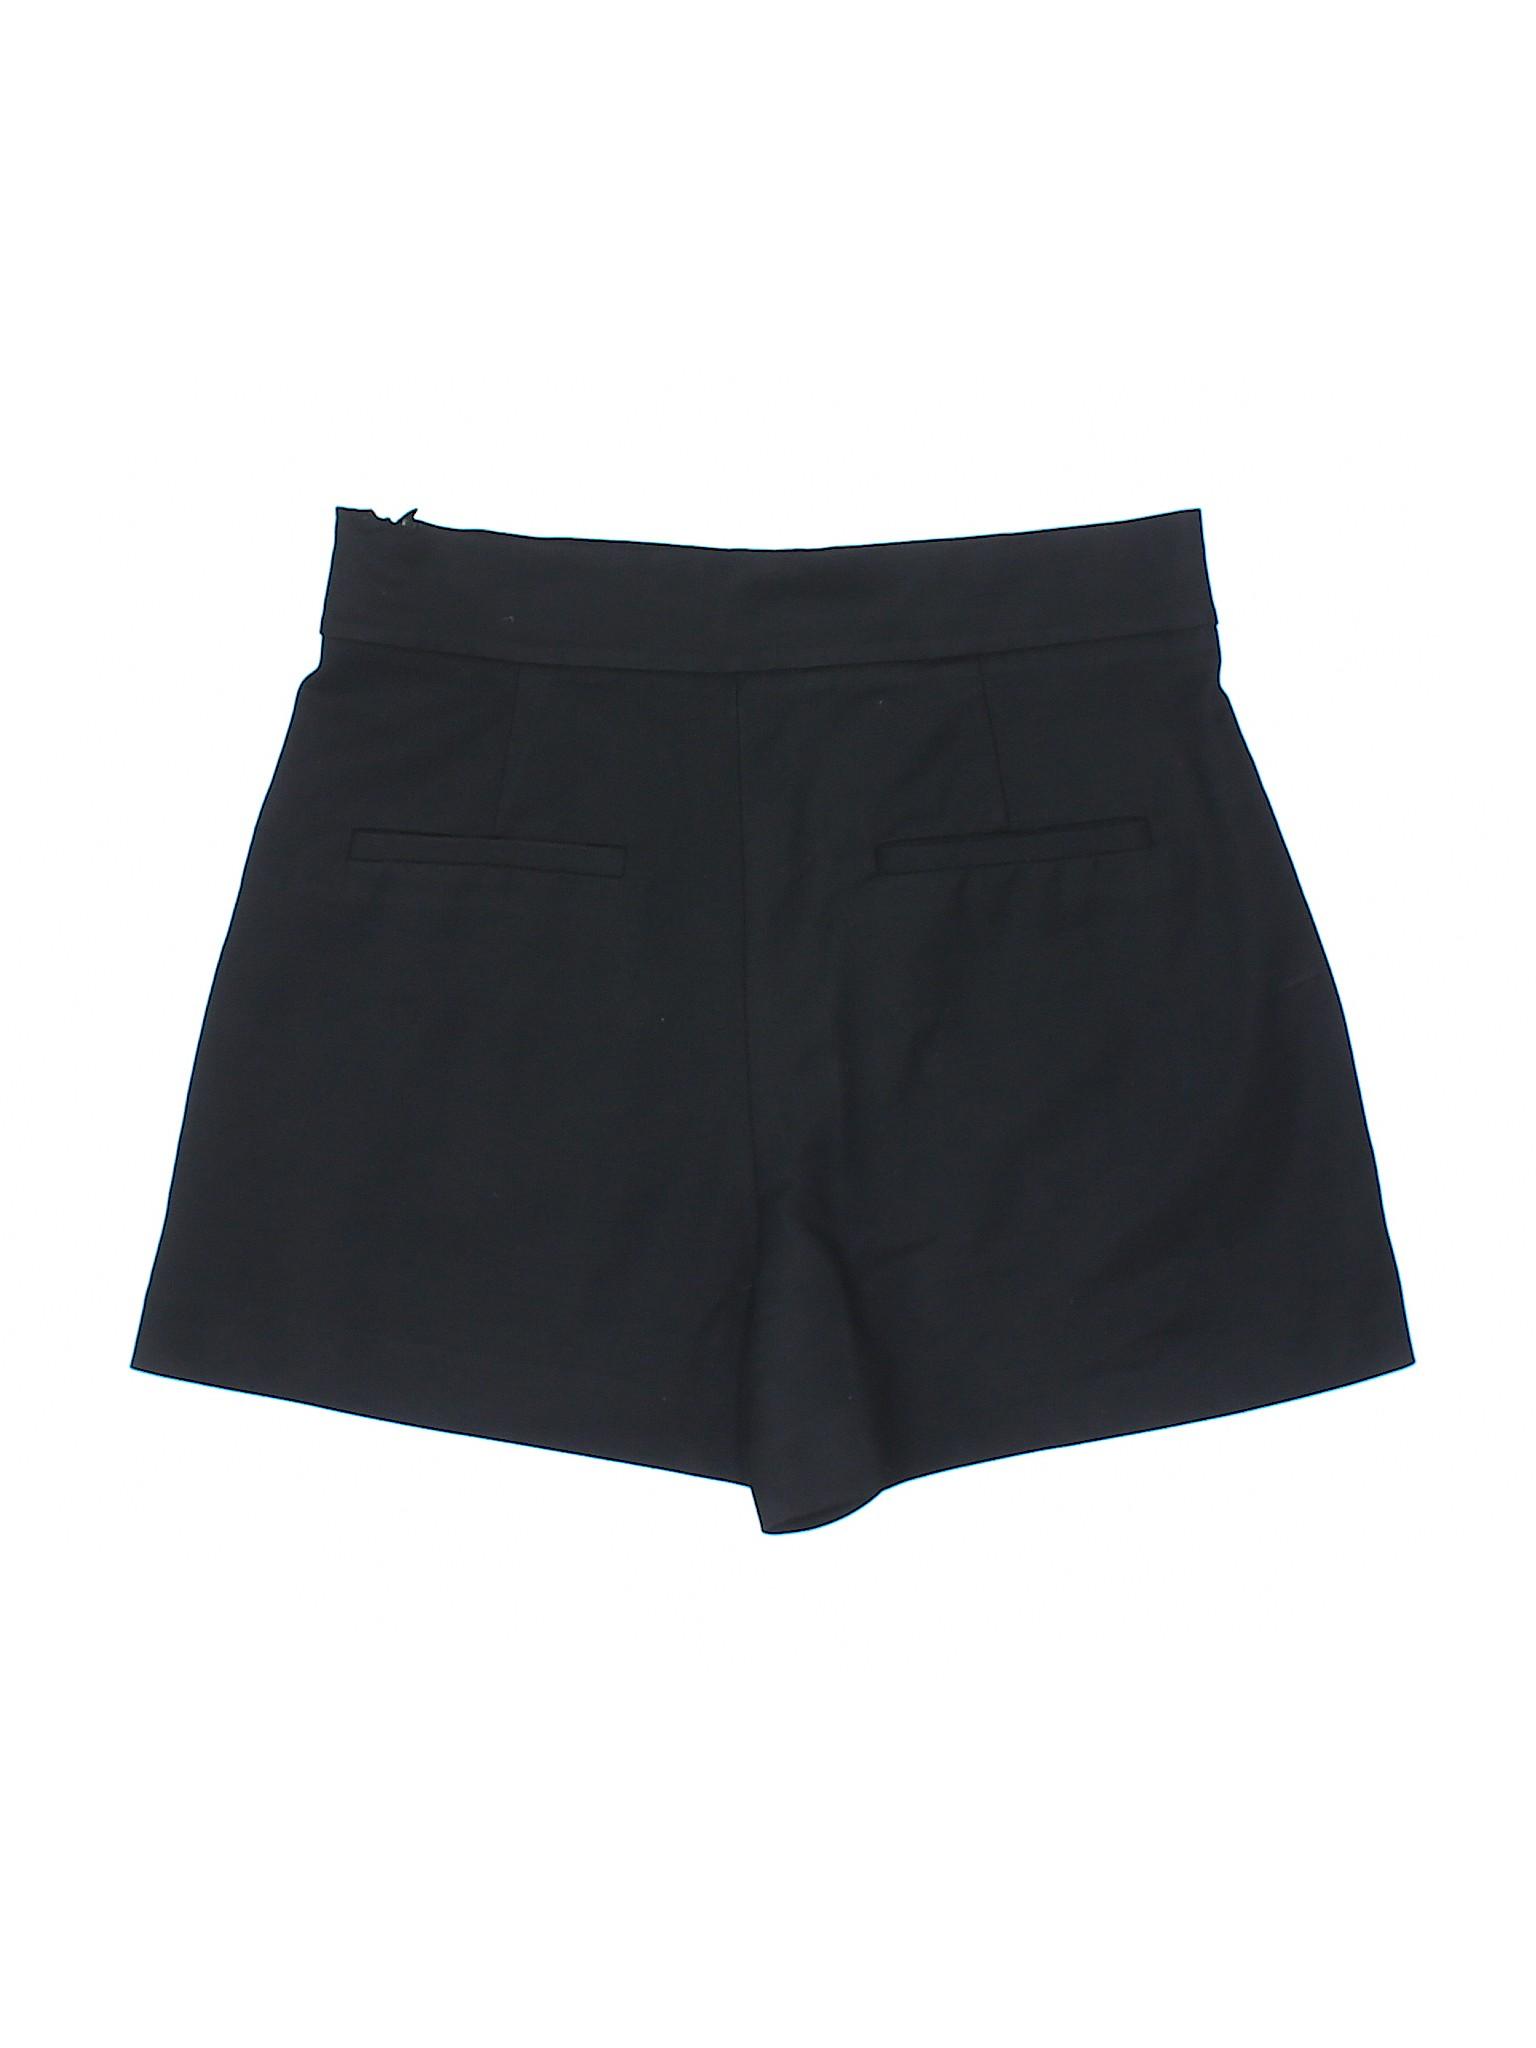 Zara Zara Shorts Boutique winter winter Shorts Zara Boutique Boutique Shorts winter Zara winter Boutique xrE7dwrHq